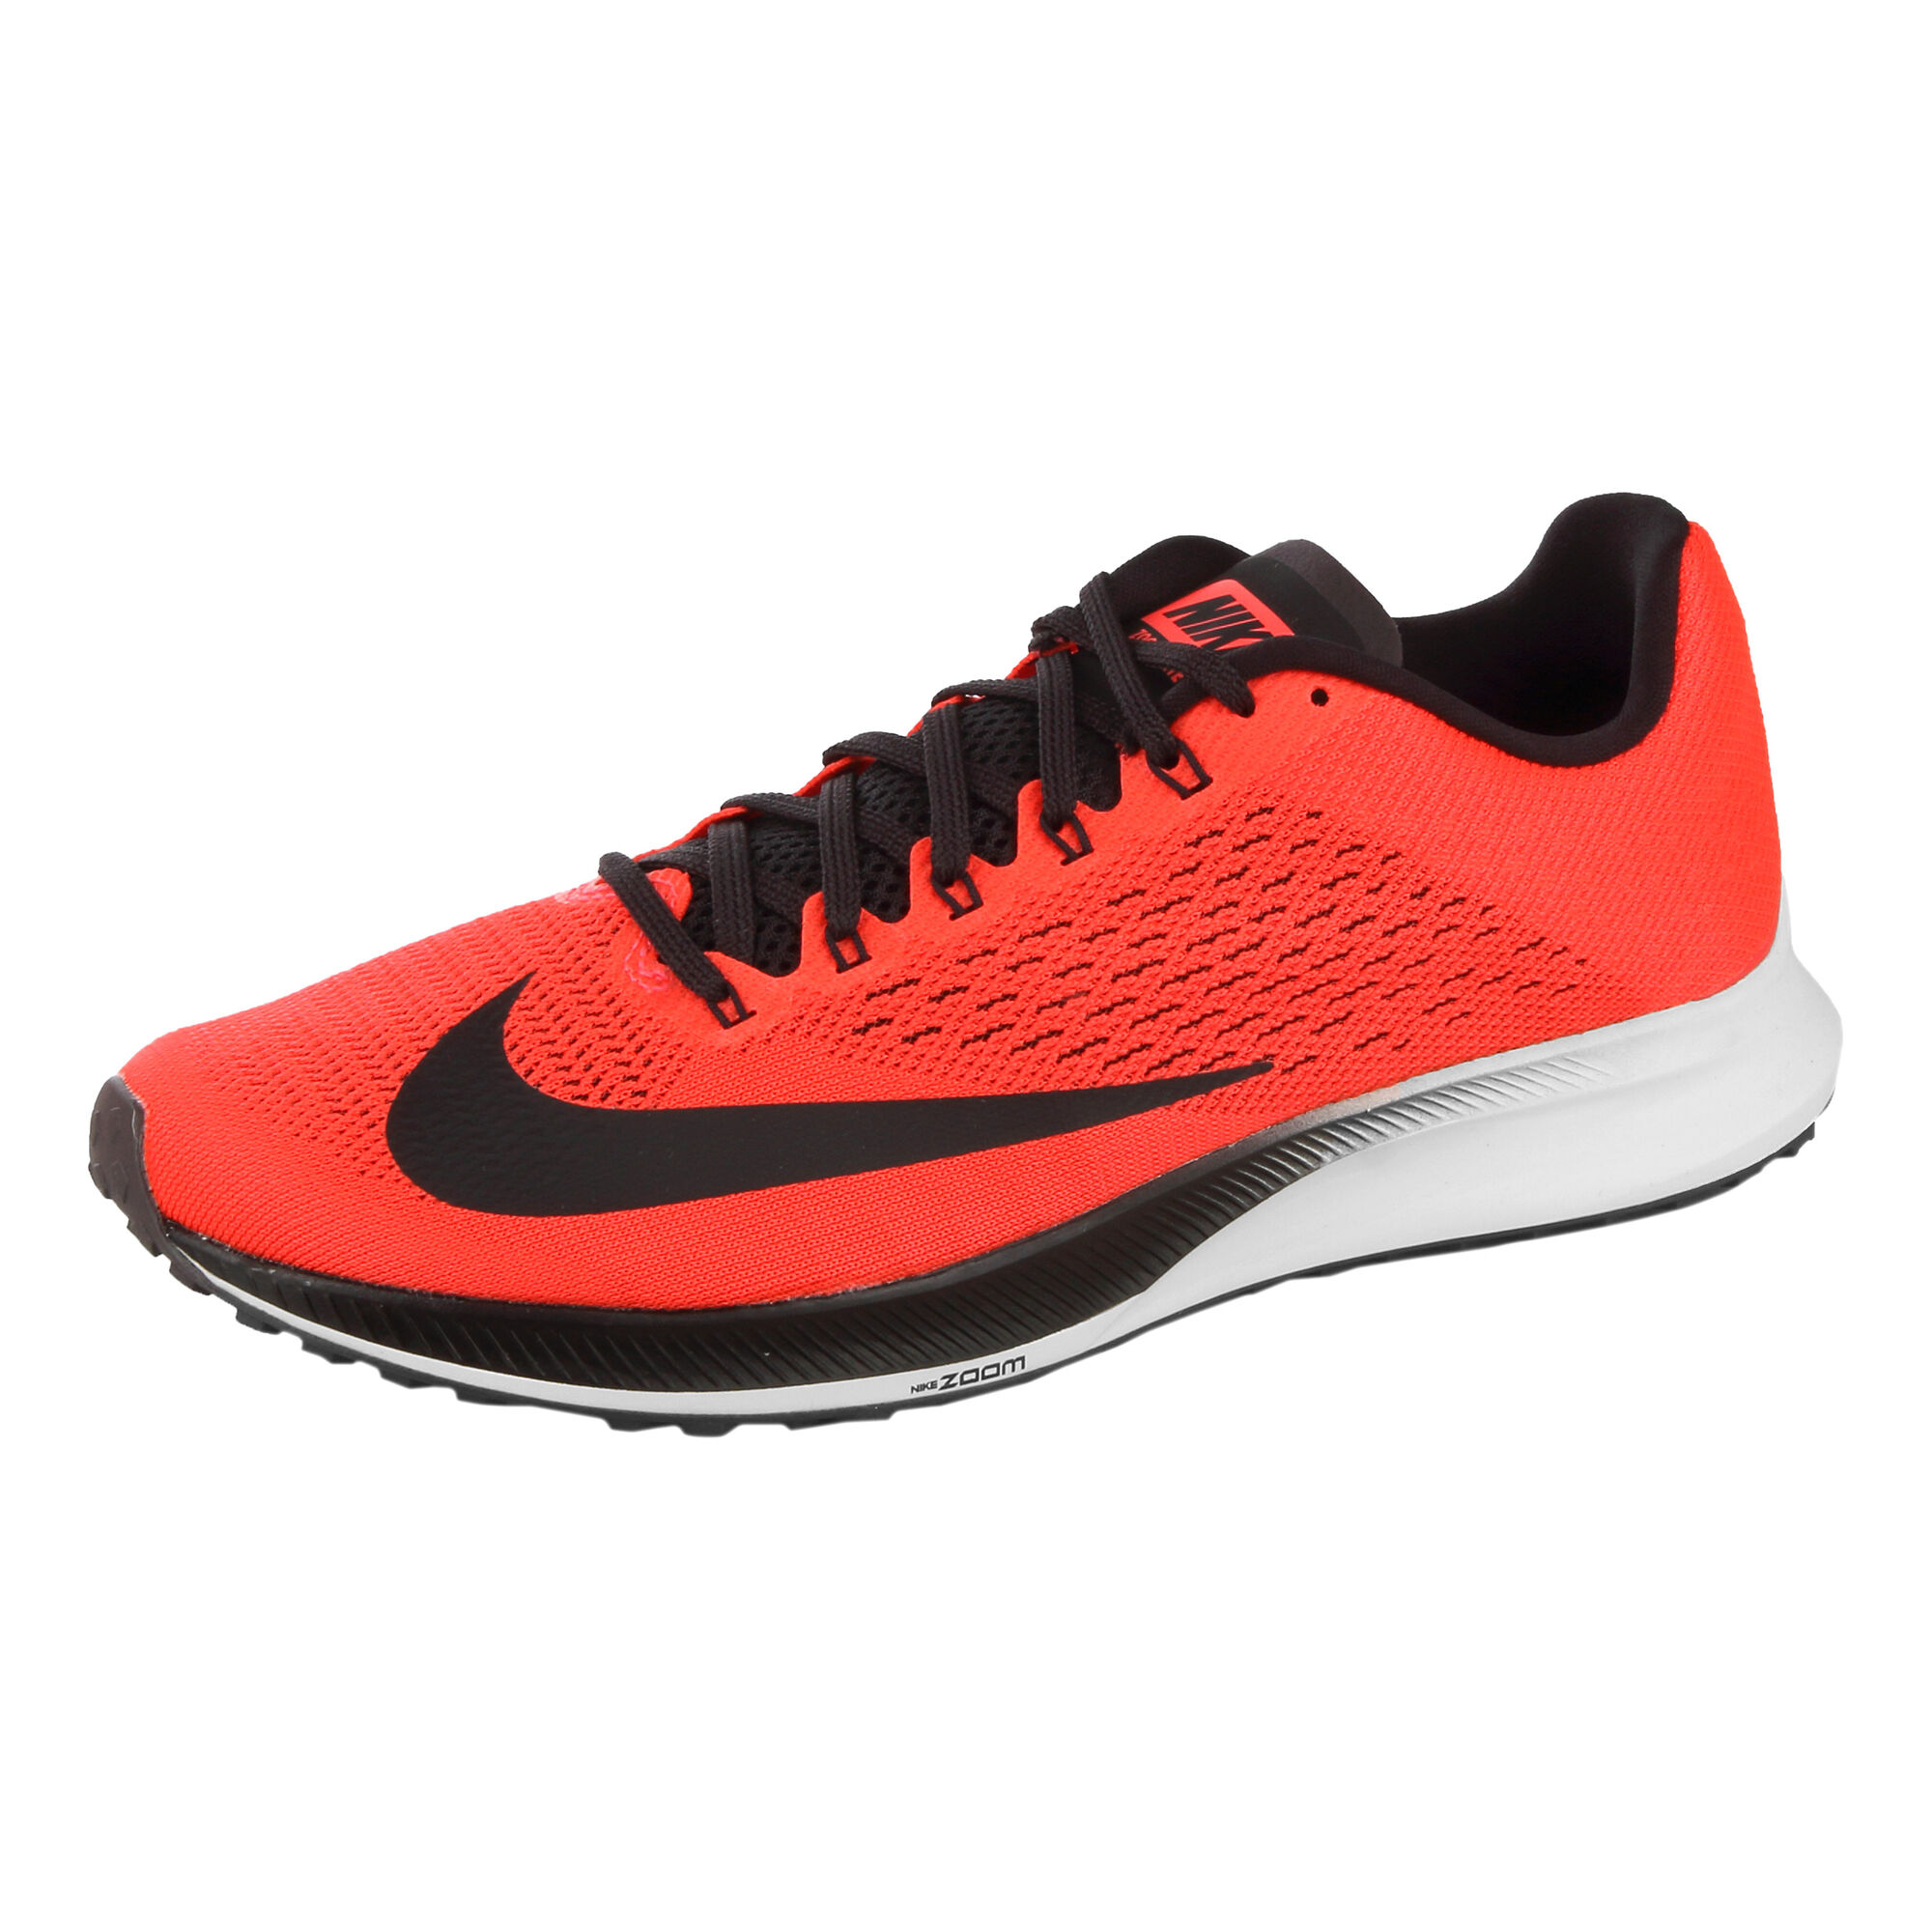 hot sale online d65fa 69d80 buy Nike Air Zoom Elite 10 Neutral Running Shoe Men - Red ...